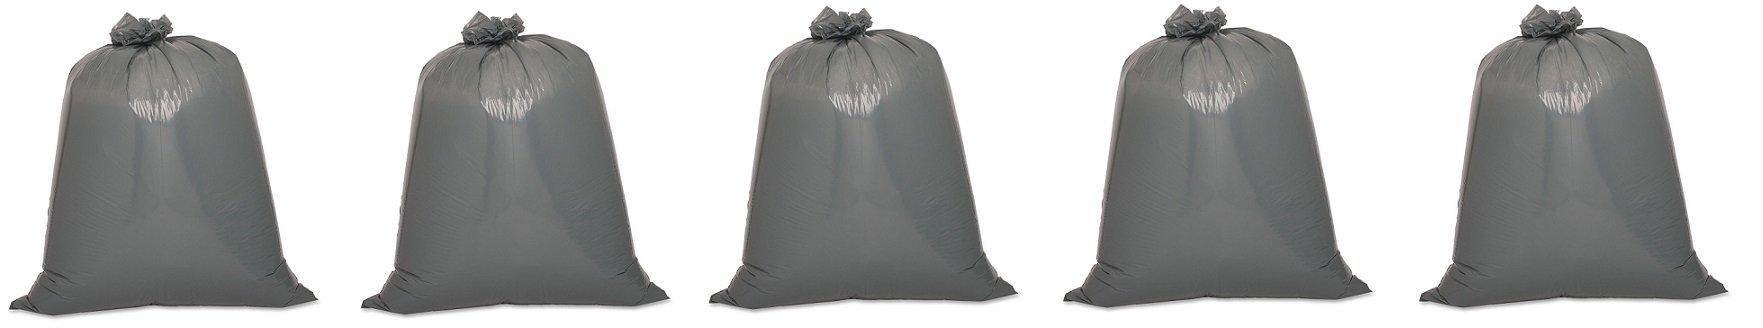 Genuine Joe GJO70343 Maximum Strength Low-Density Resin Trash Can Liner, 55 gallon Capacity, 56'' Length x 39'' Width x 1.55 mil Thickness, Black (Case of 50) (5-(Case of 50))